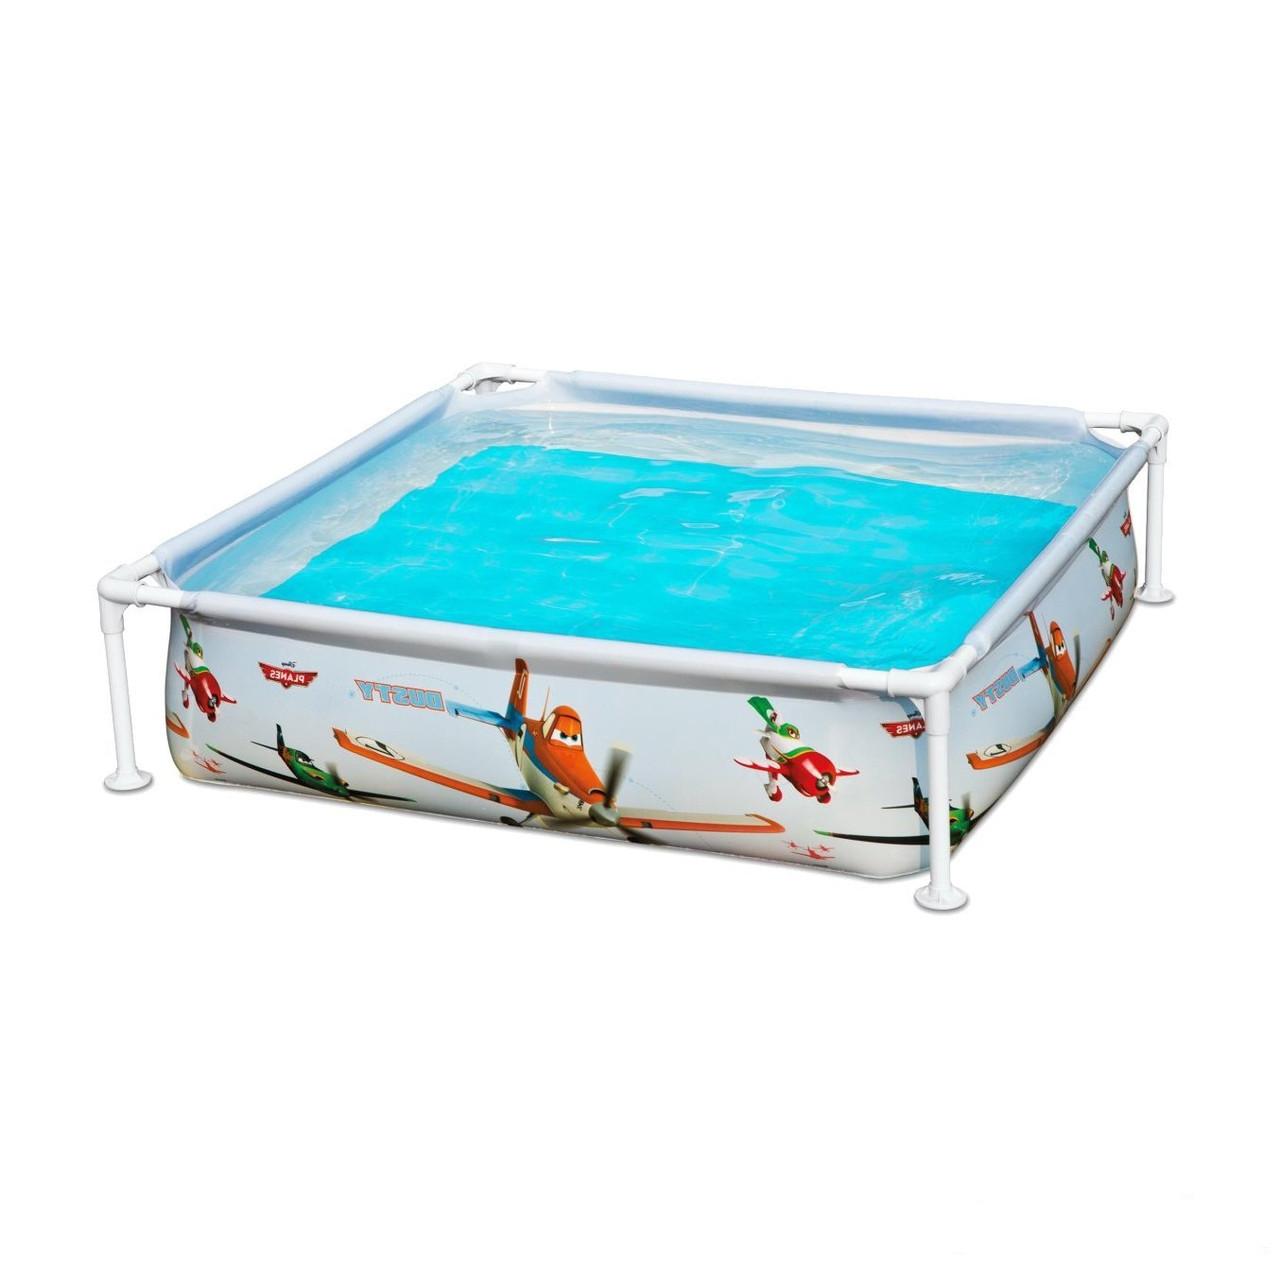 Каркасный бассейн басейн  Intex 57174. 122х122х30 см Детский Small Frame Басейн квадратный